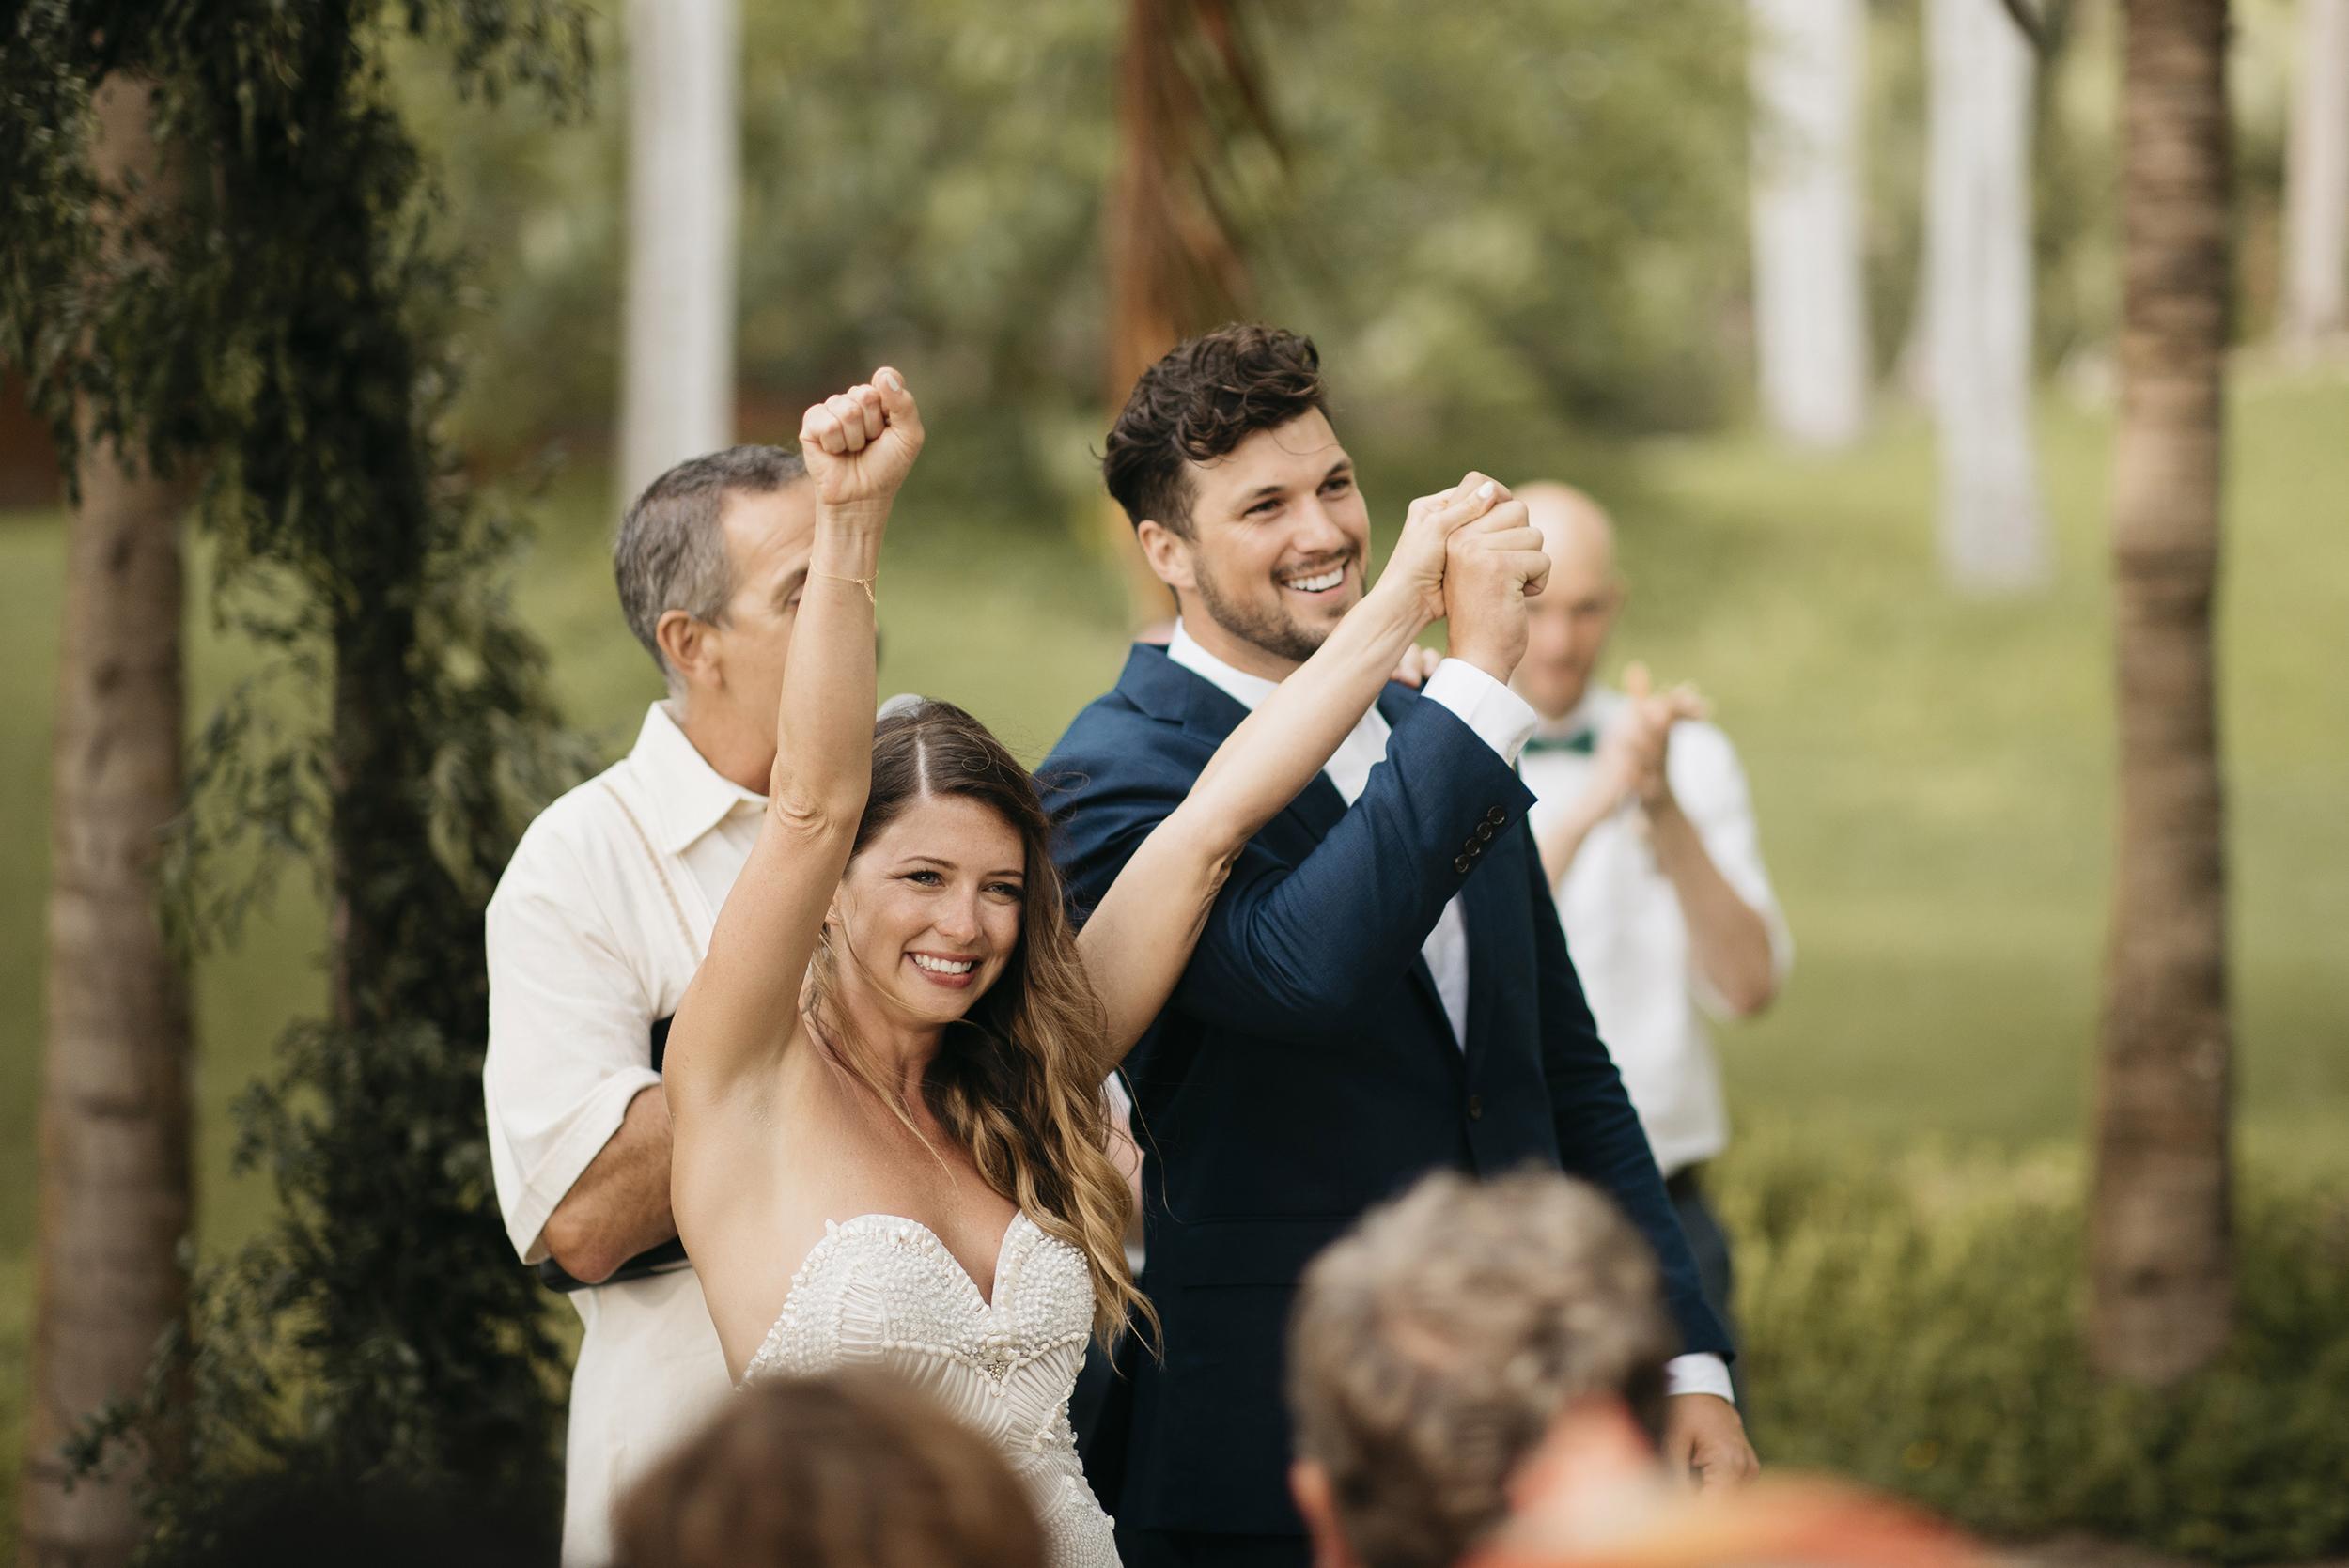 Colby-and-Jess-Intimate-Destination-Wedding-Sayulita-Puerto-Vallarta-Mexico289.jpg